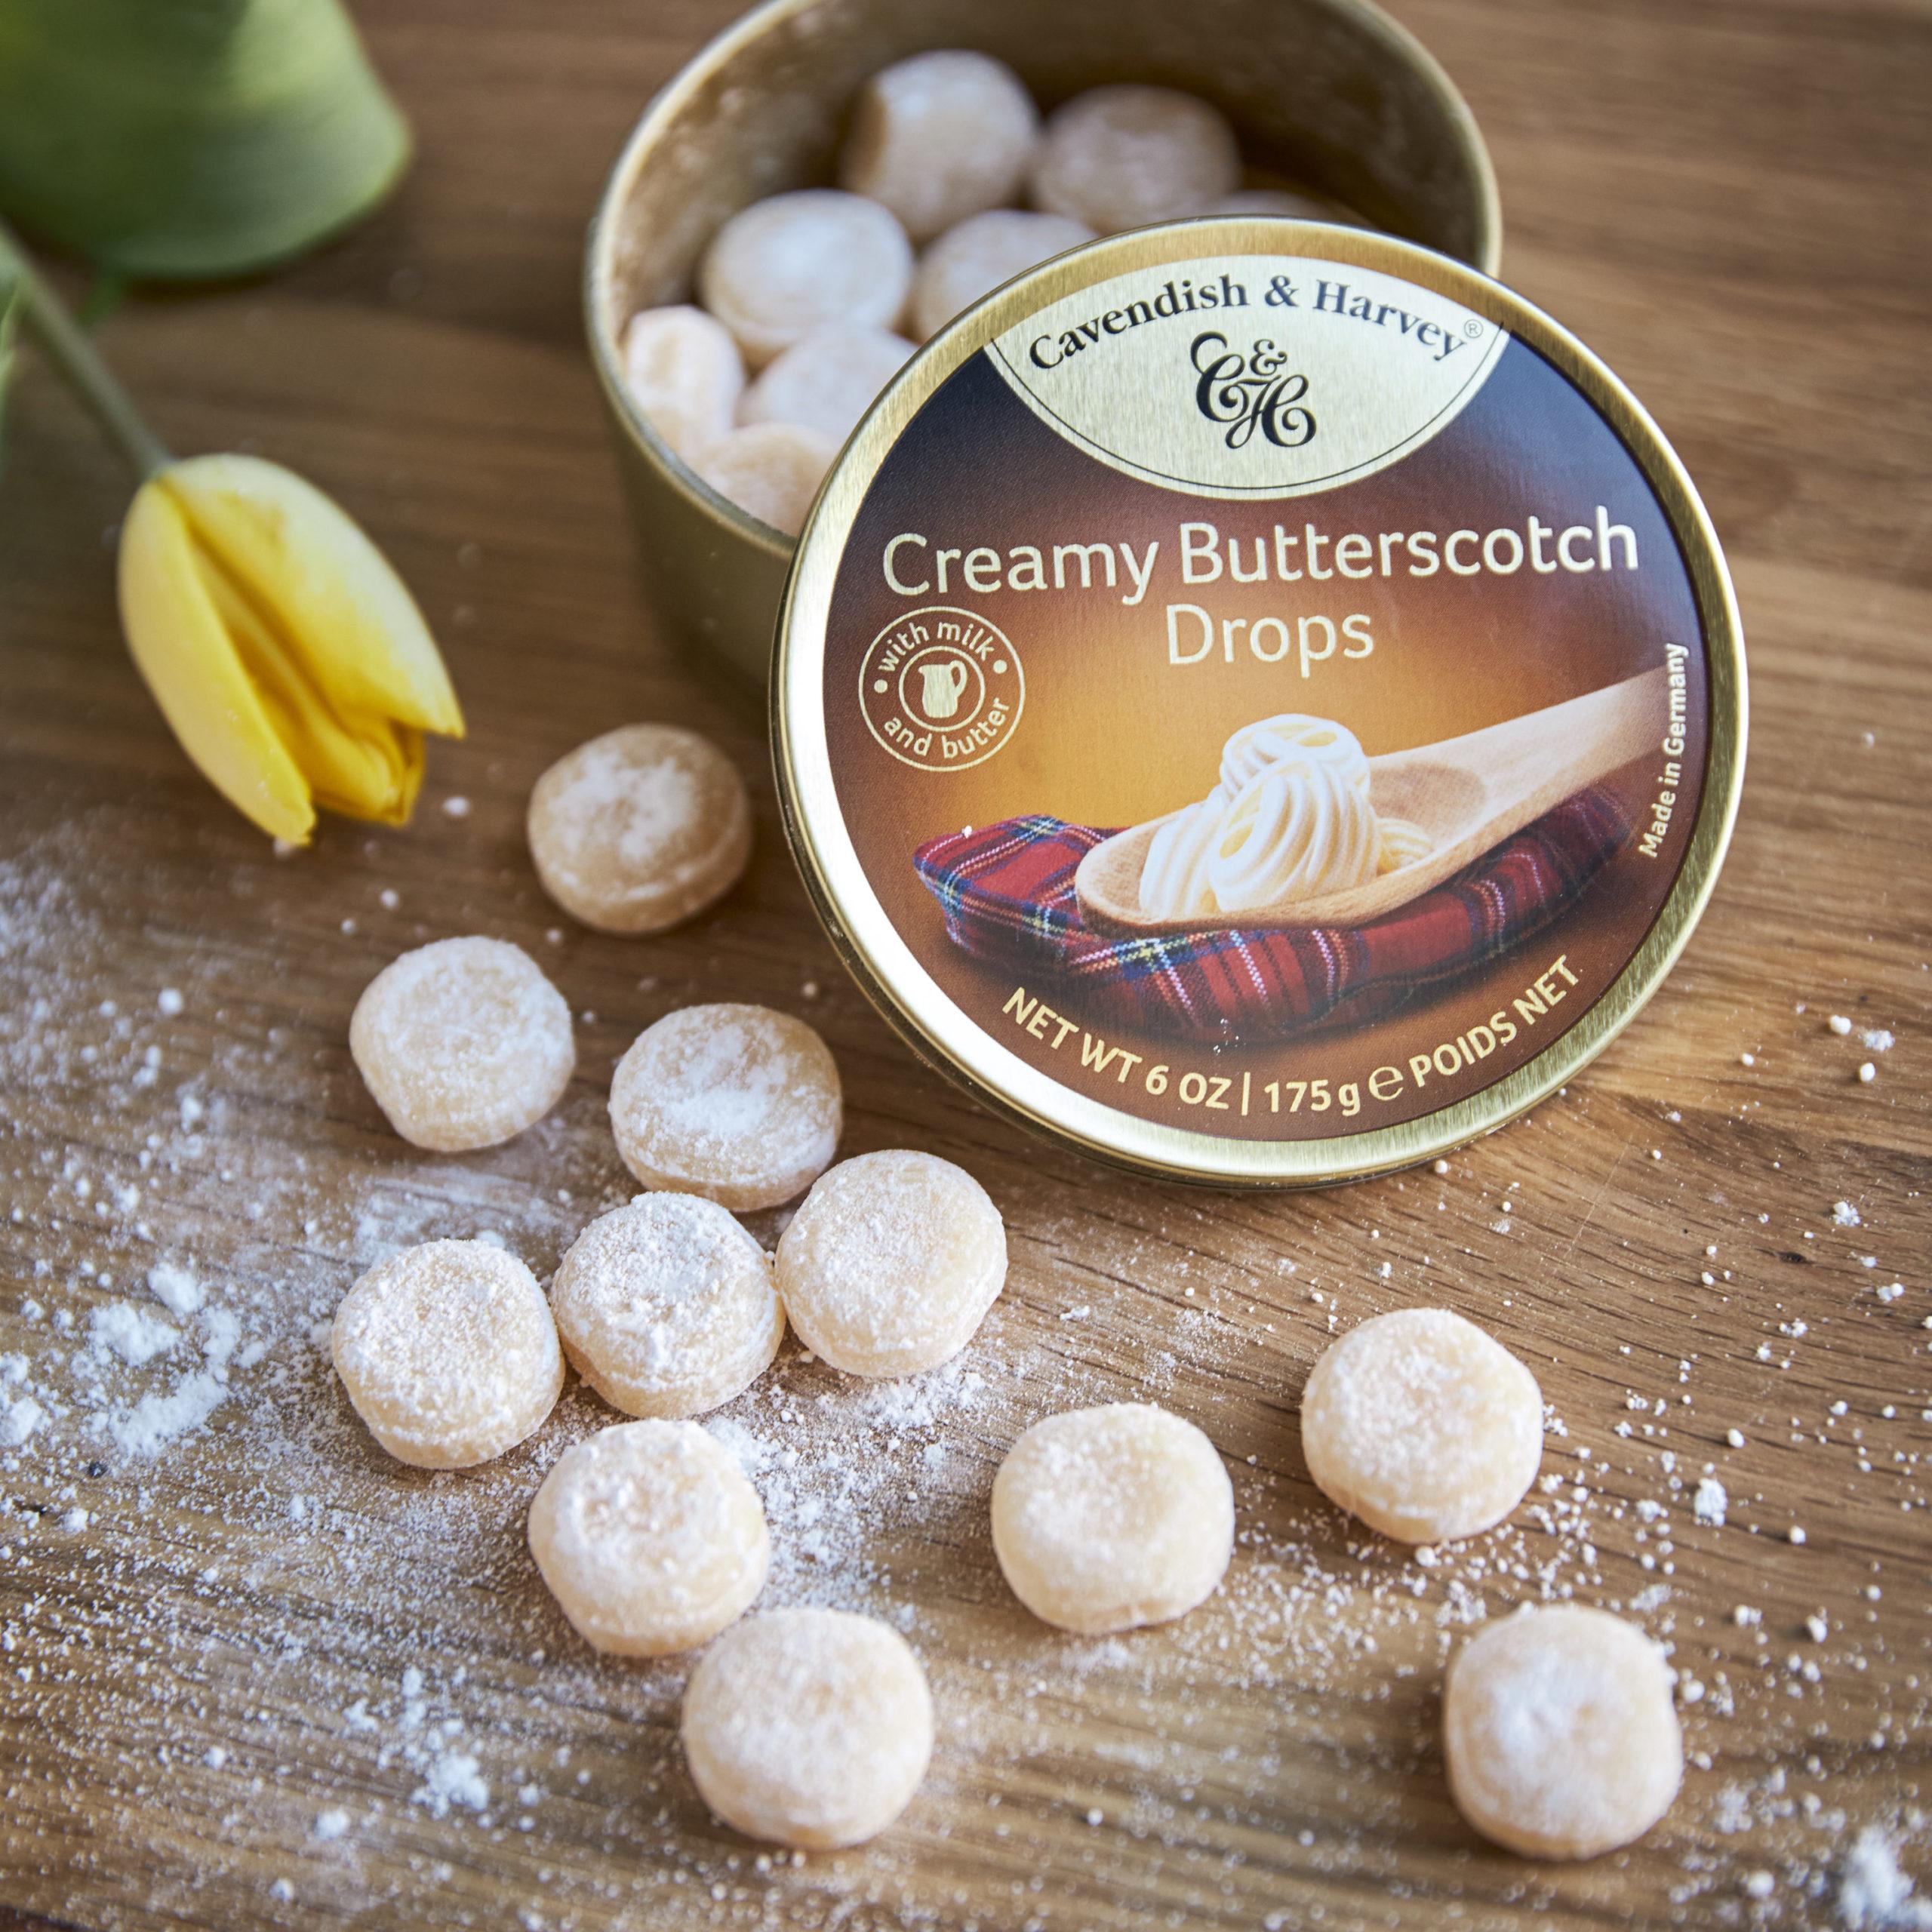 Was ist das Besondere an Creamy Butterscotch Drops?